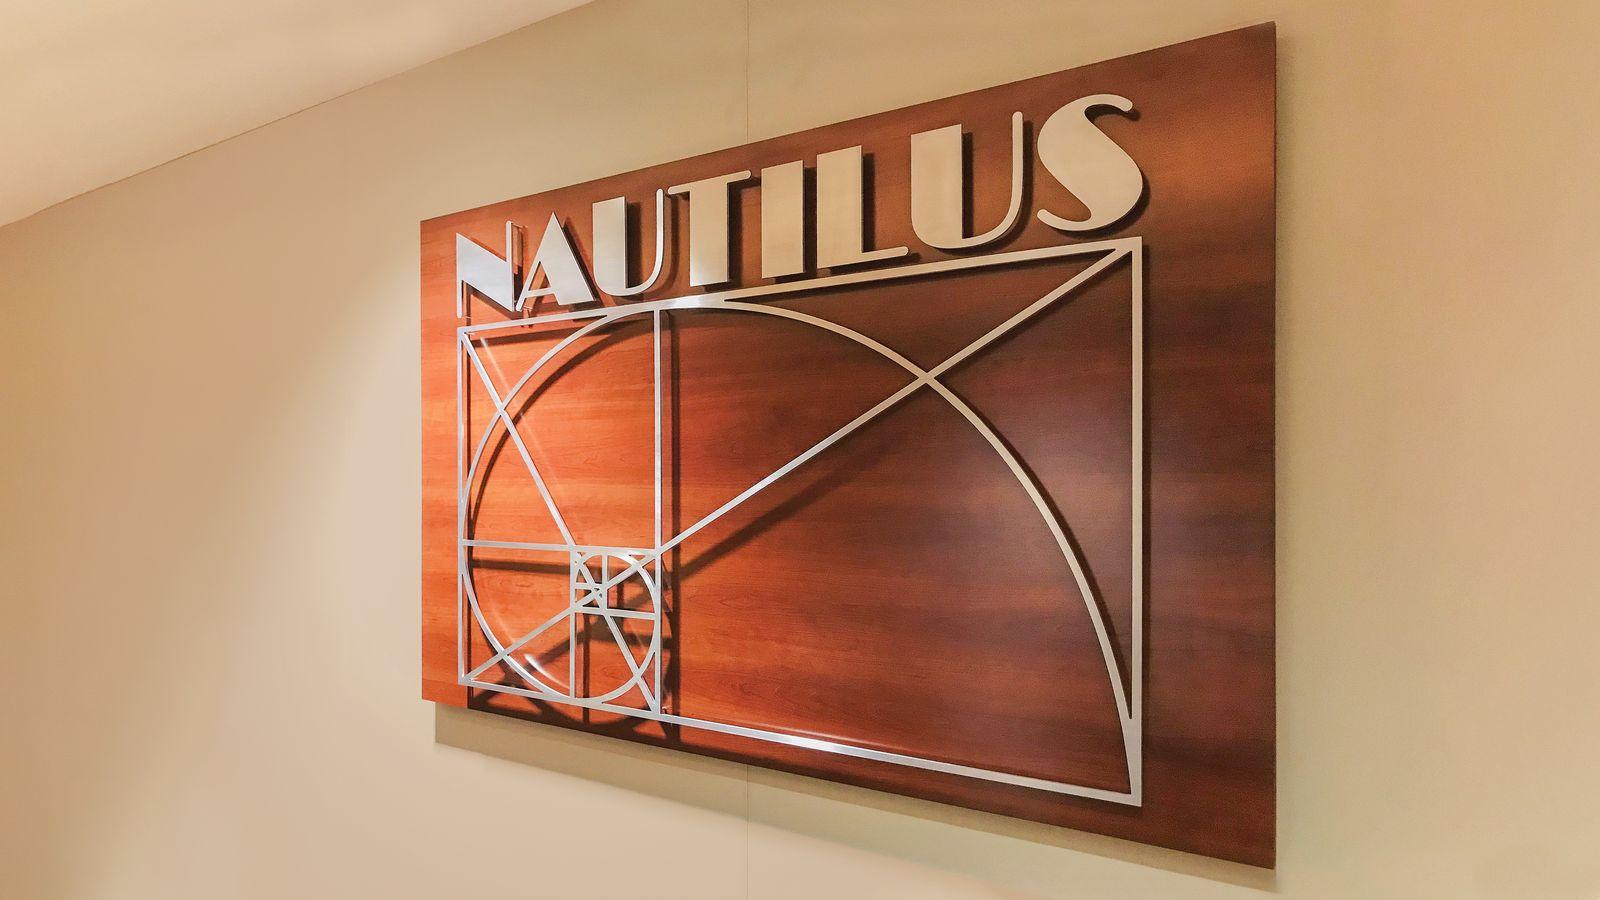 Nautilus wooden sign